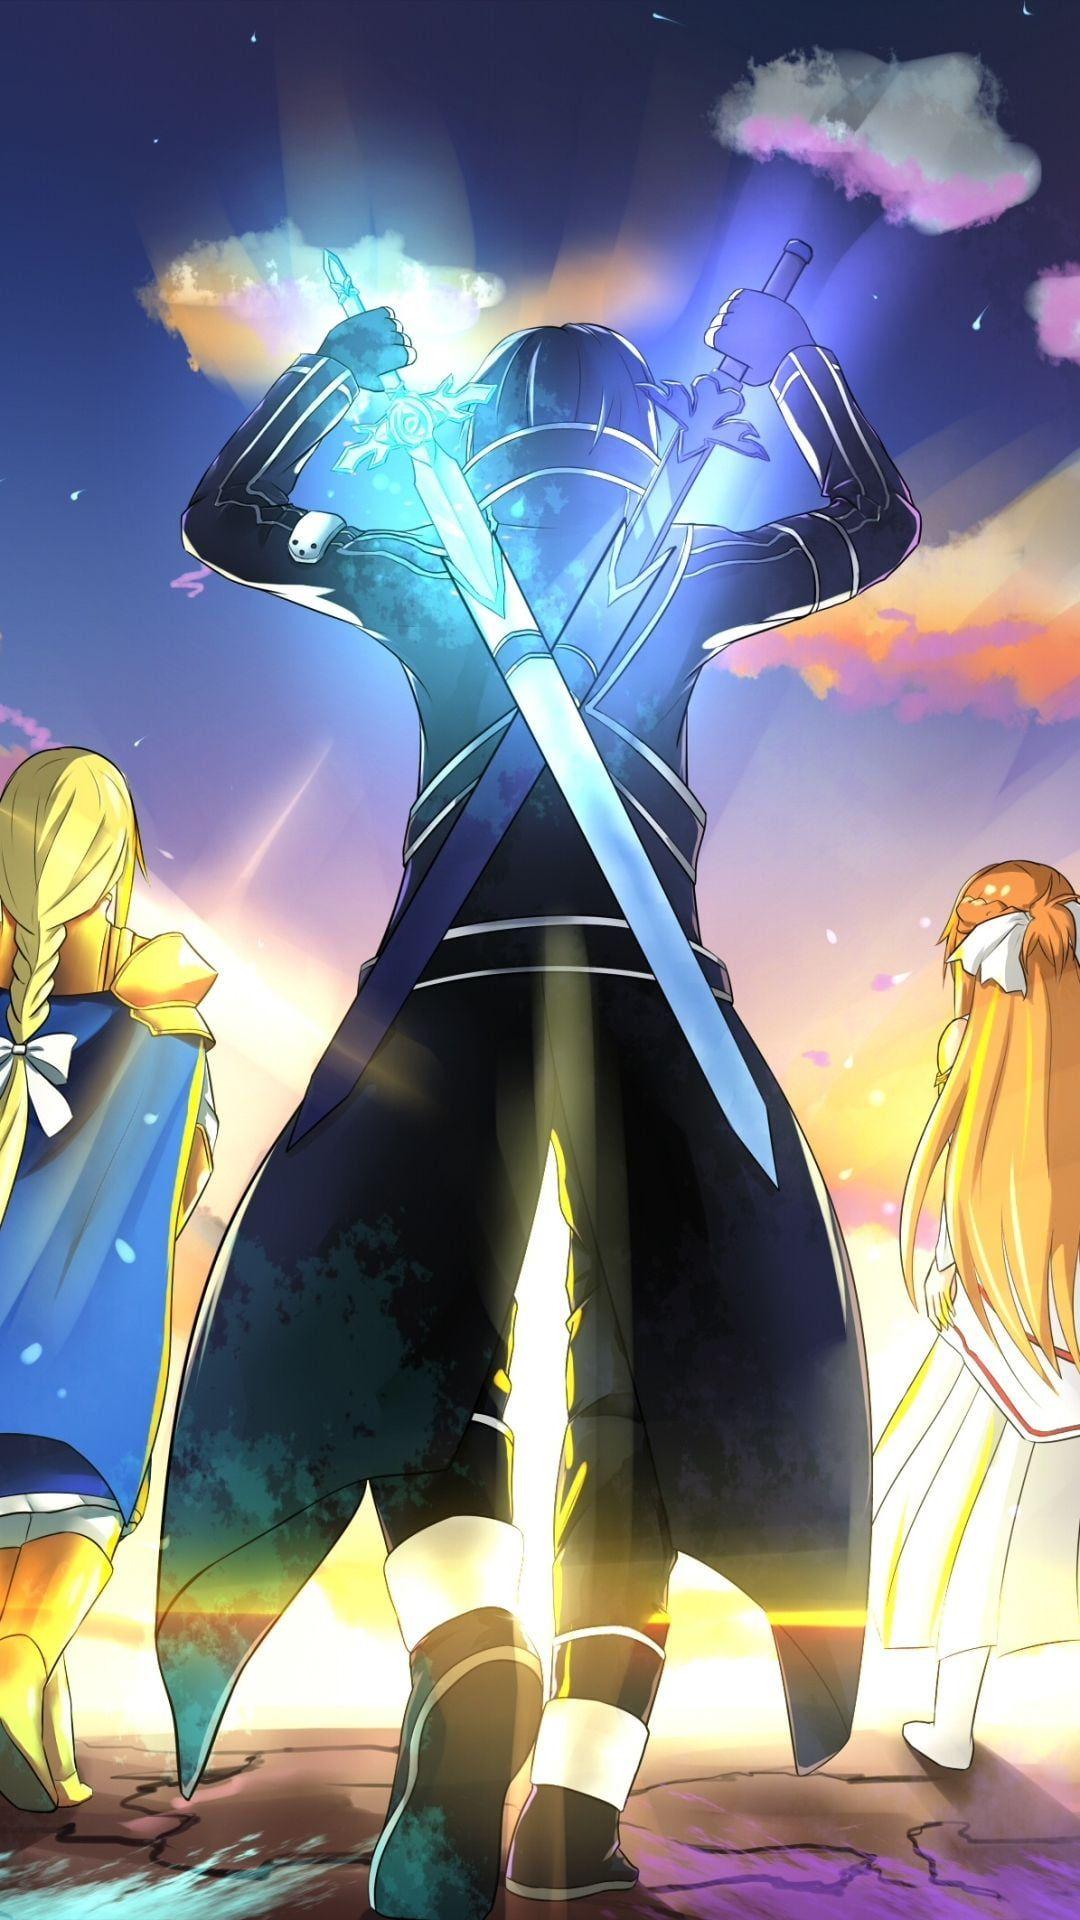 Anime Sword Art Online Alicization Kirito Sword Art Online Kirigaya Kazuto Alice Sword Art Onli In 2020 Sword Art Online Asuna Sword Art Sword Art Online Wallpaper